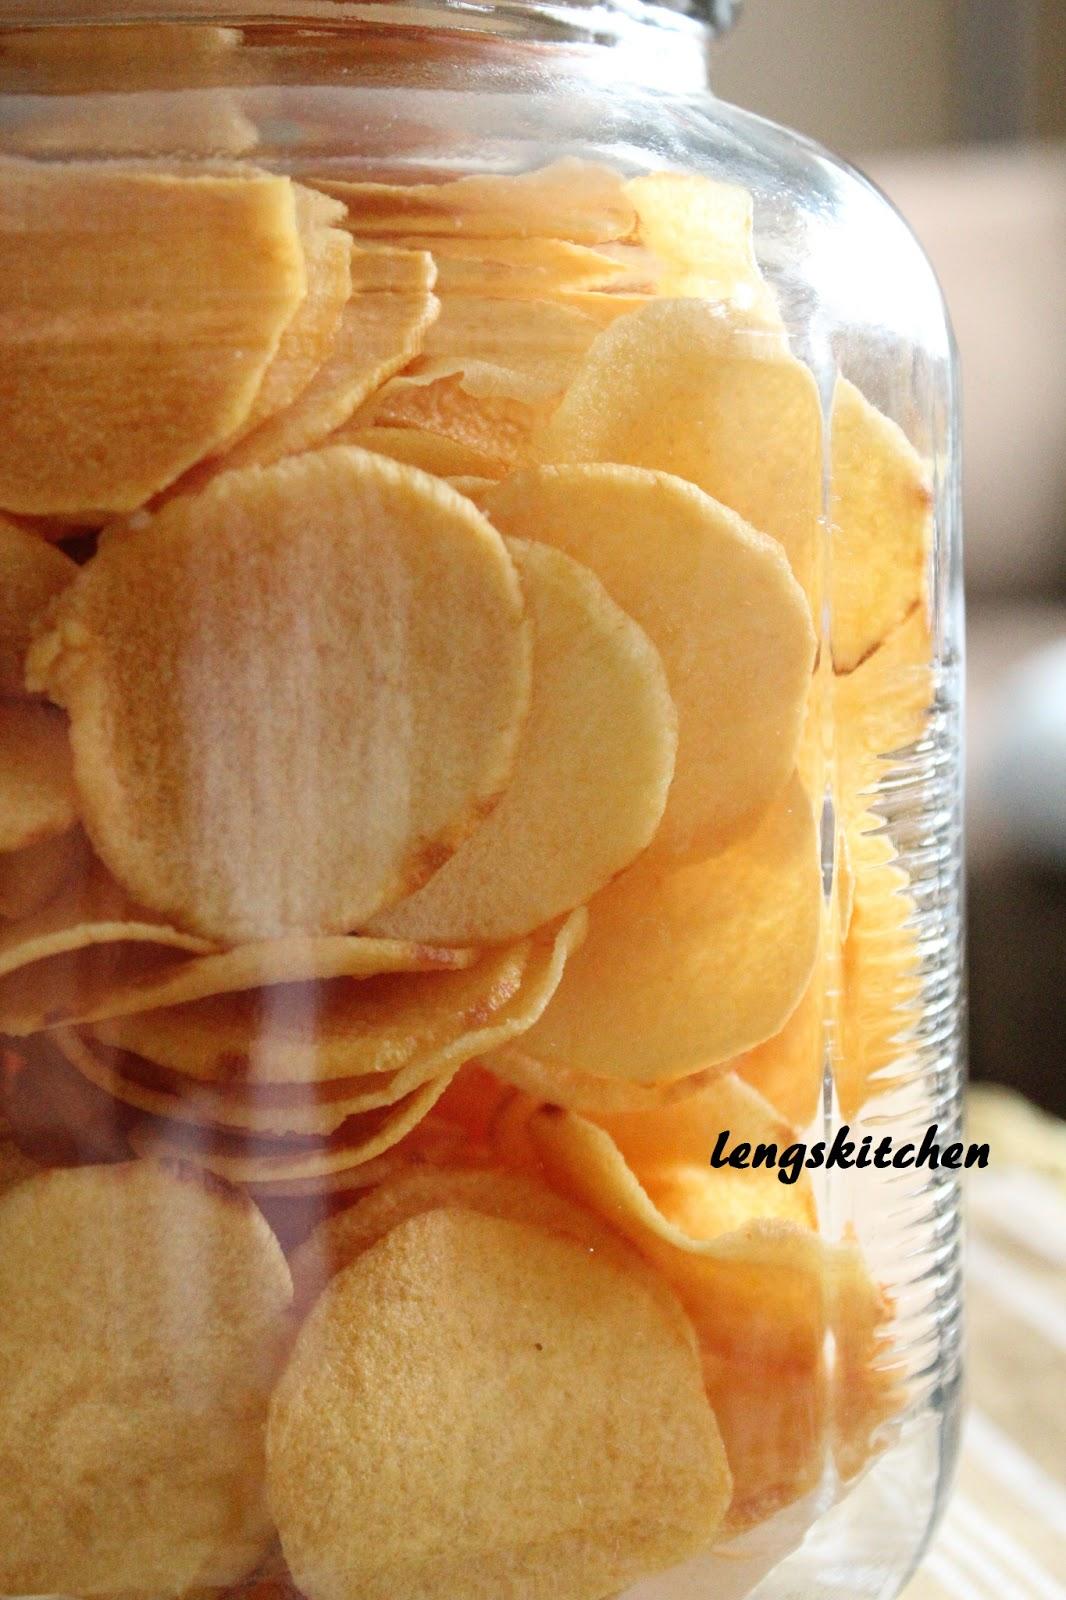 Single Sink Kitchen Cabinets Storage Ideas Chaos: Ngaku (arrowhead) Chips 炸芽菇饼 - Chinese New ...